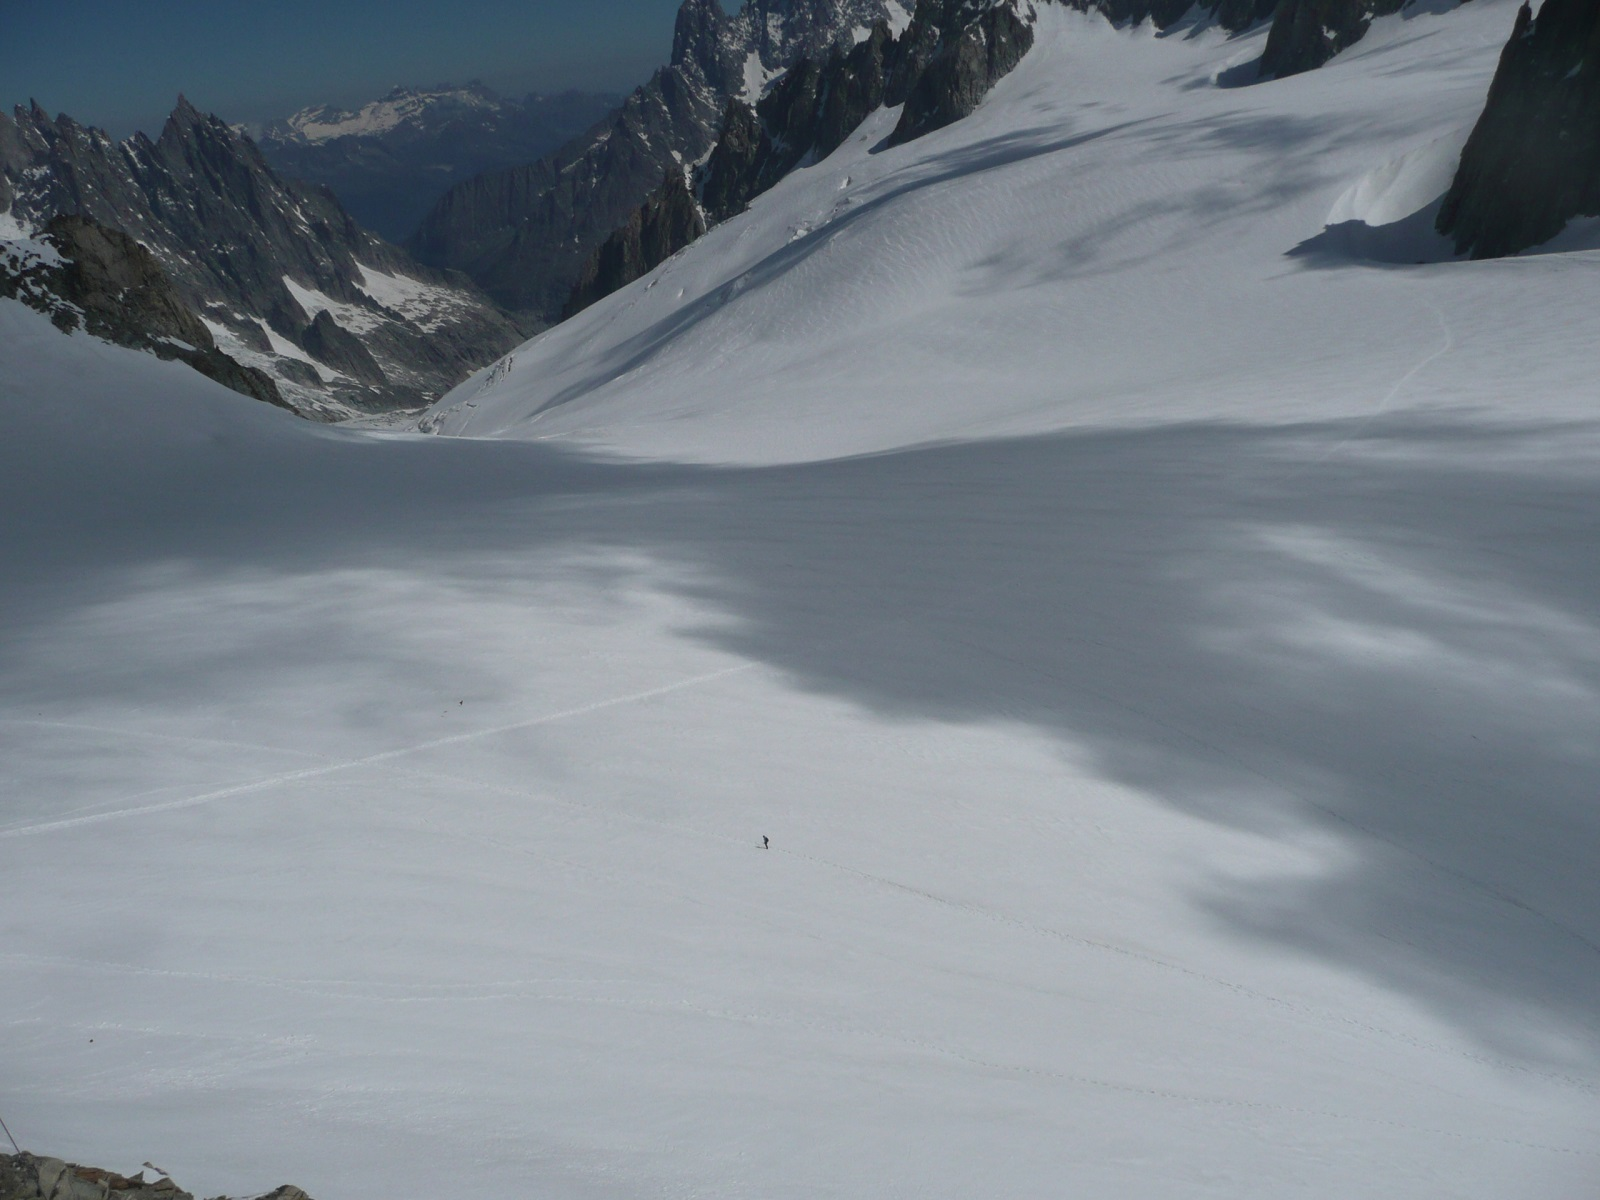 mer de glace - debajo de punta helbronner